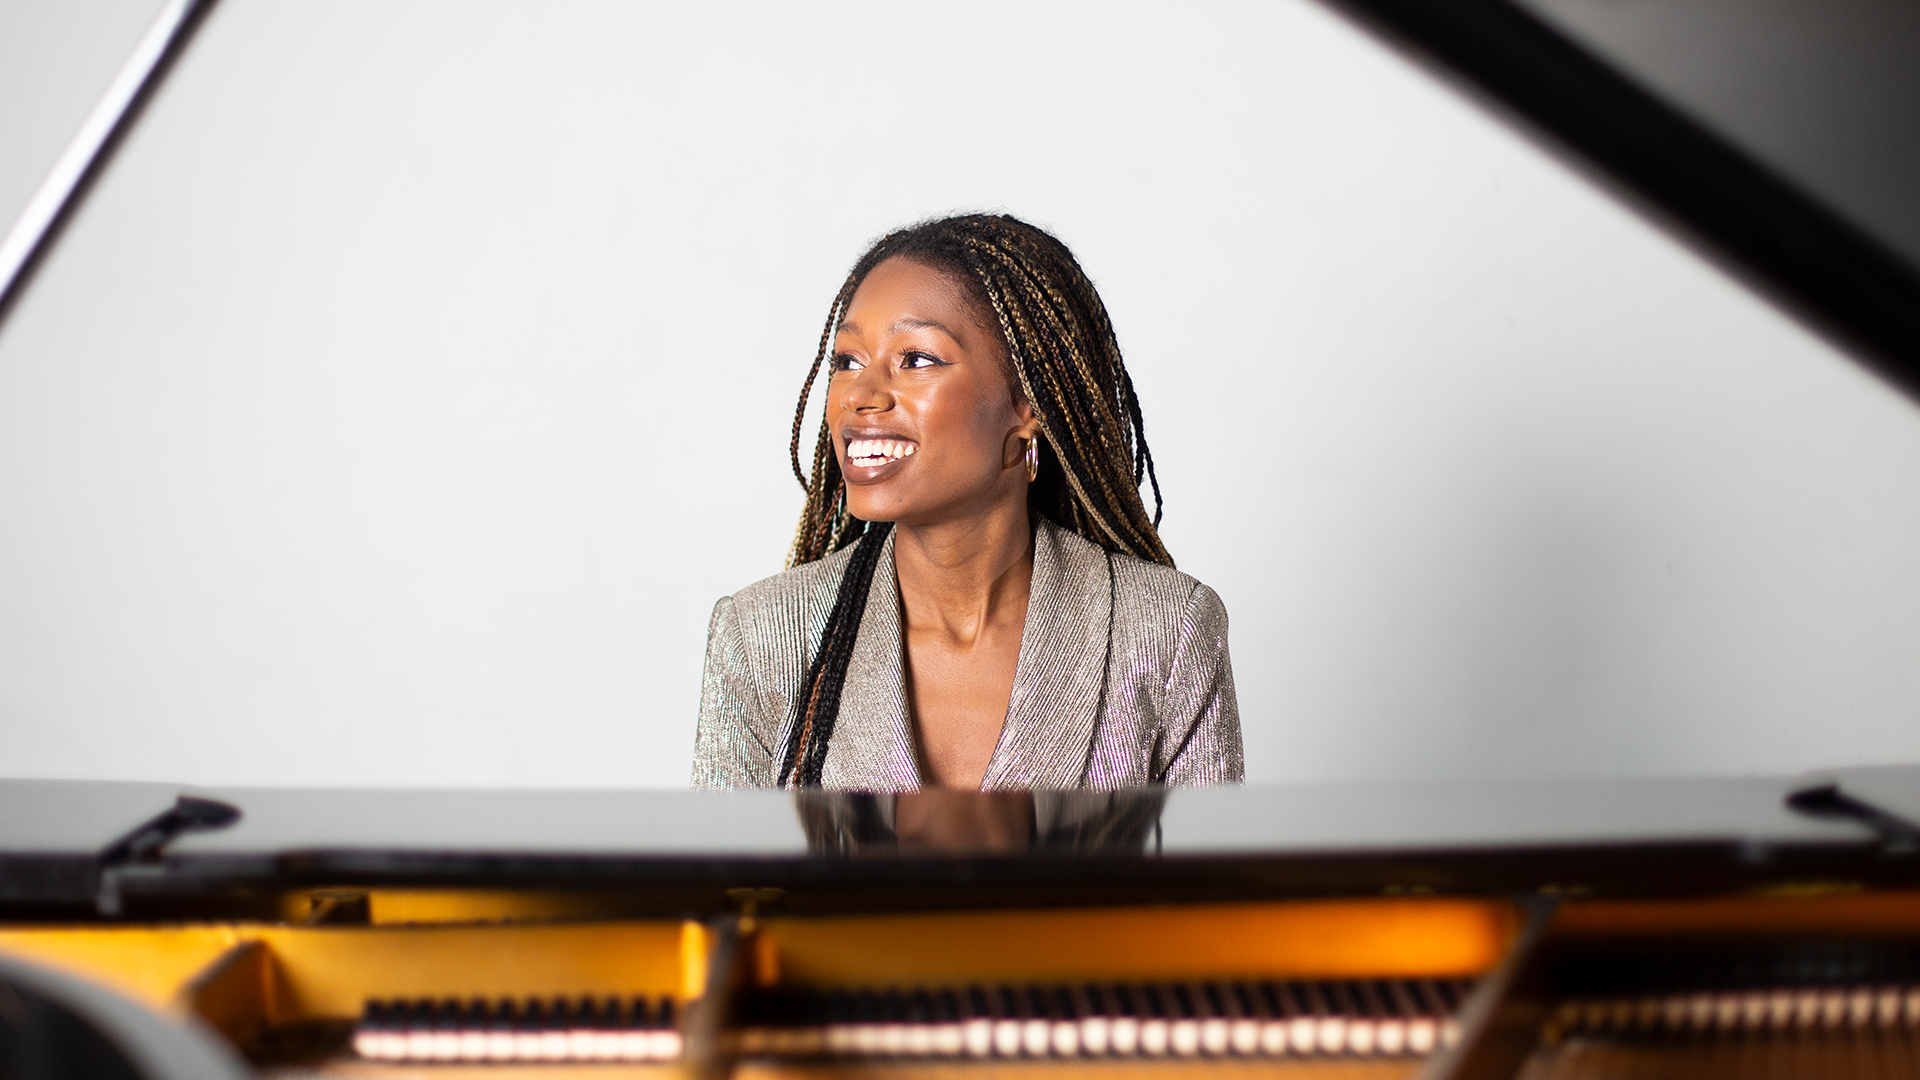 Isata Kanneh-Mason's Album 'Romance' Tops Classical Chart